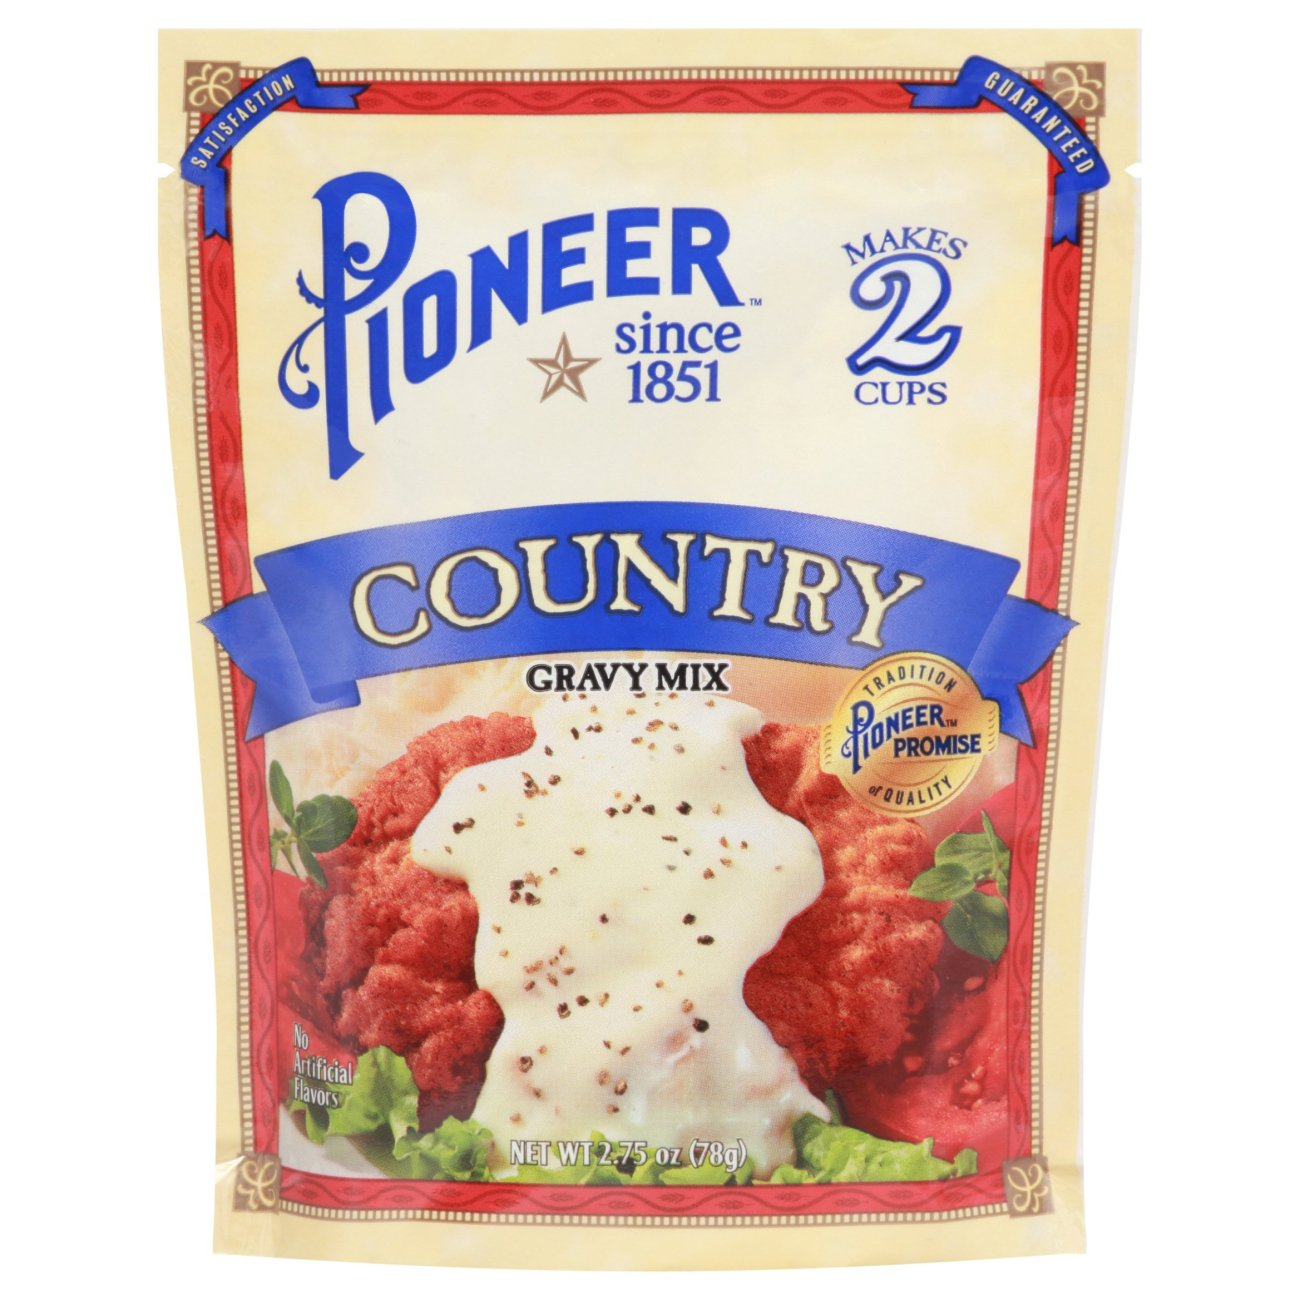 Pioneer Brand Country Gravy Mix Shop Gravy At H E B